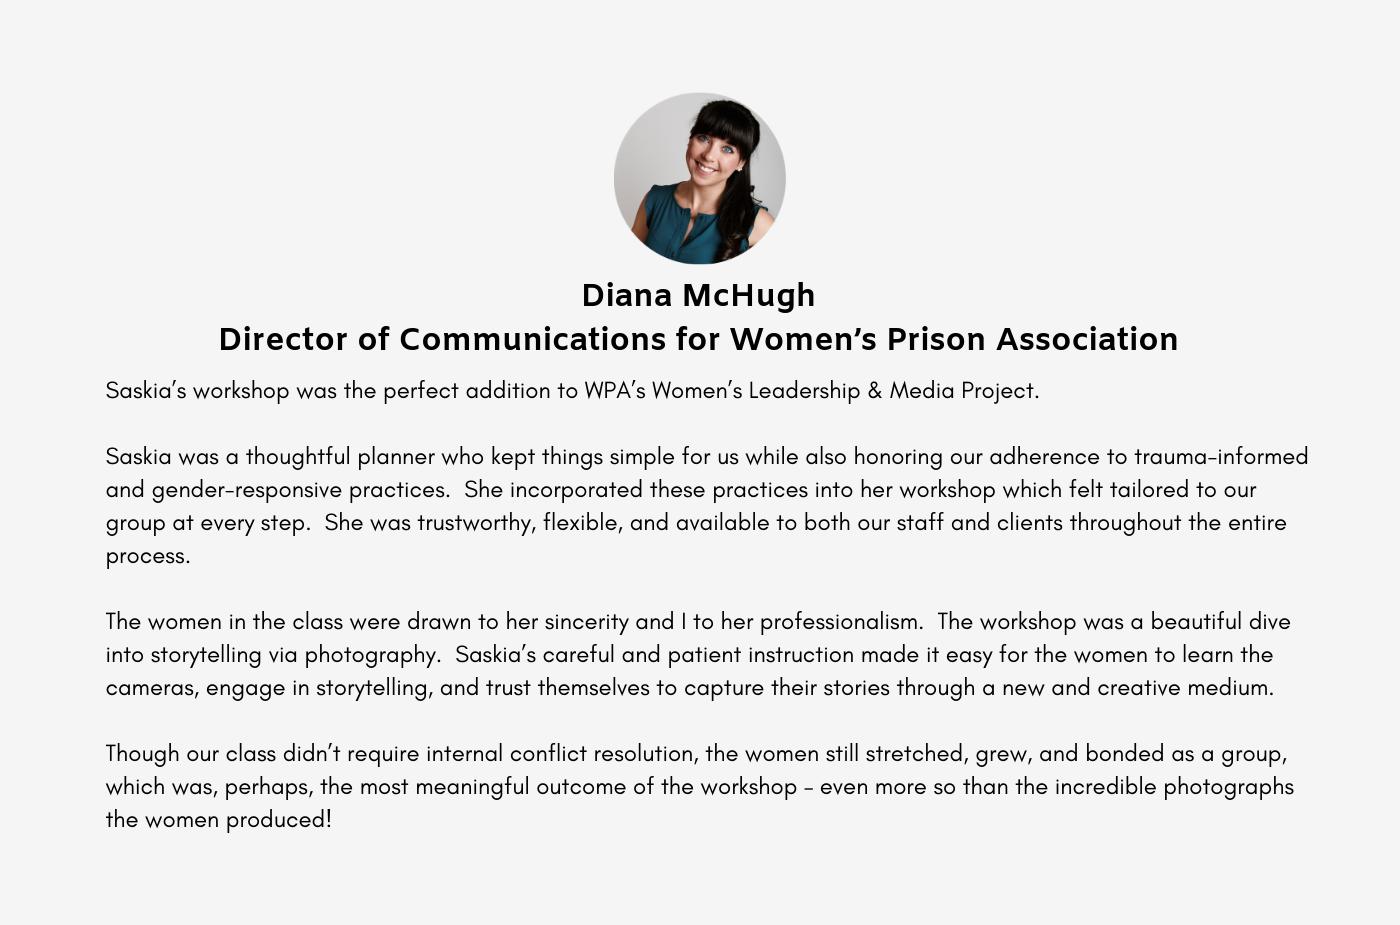 saskia-keeley-photography-humanitarian-photojournalism-documentarian-women-prison-association-accompagnateur-workshop-diana-mchugh-testimonial.png